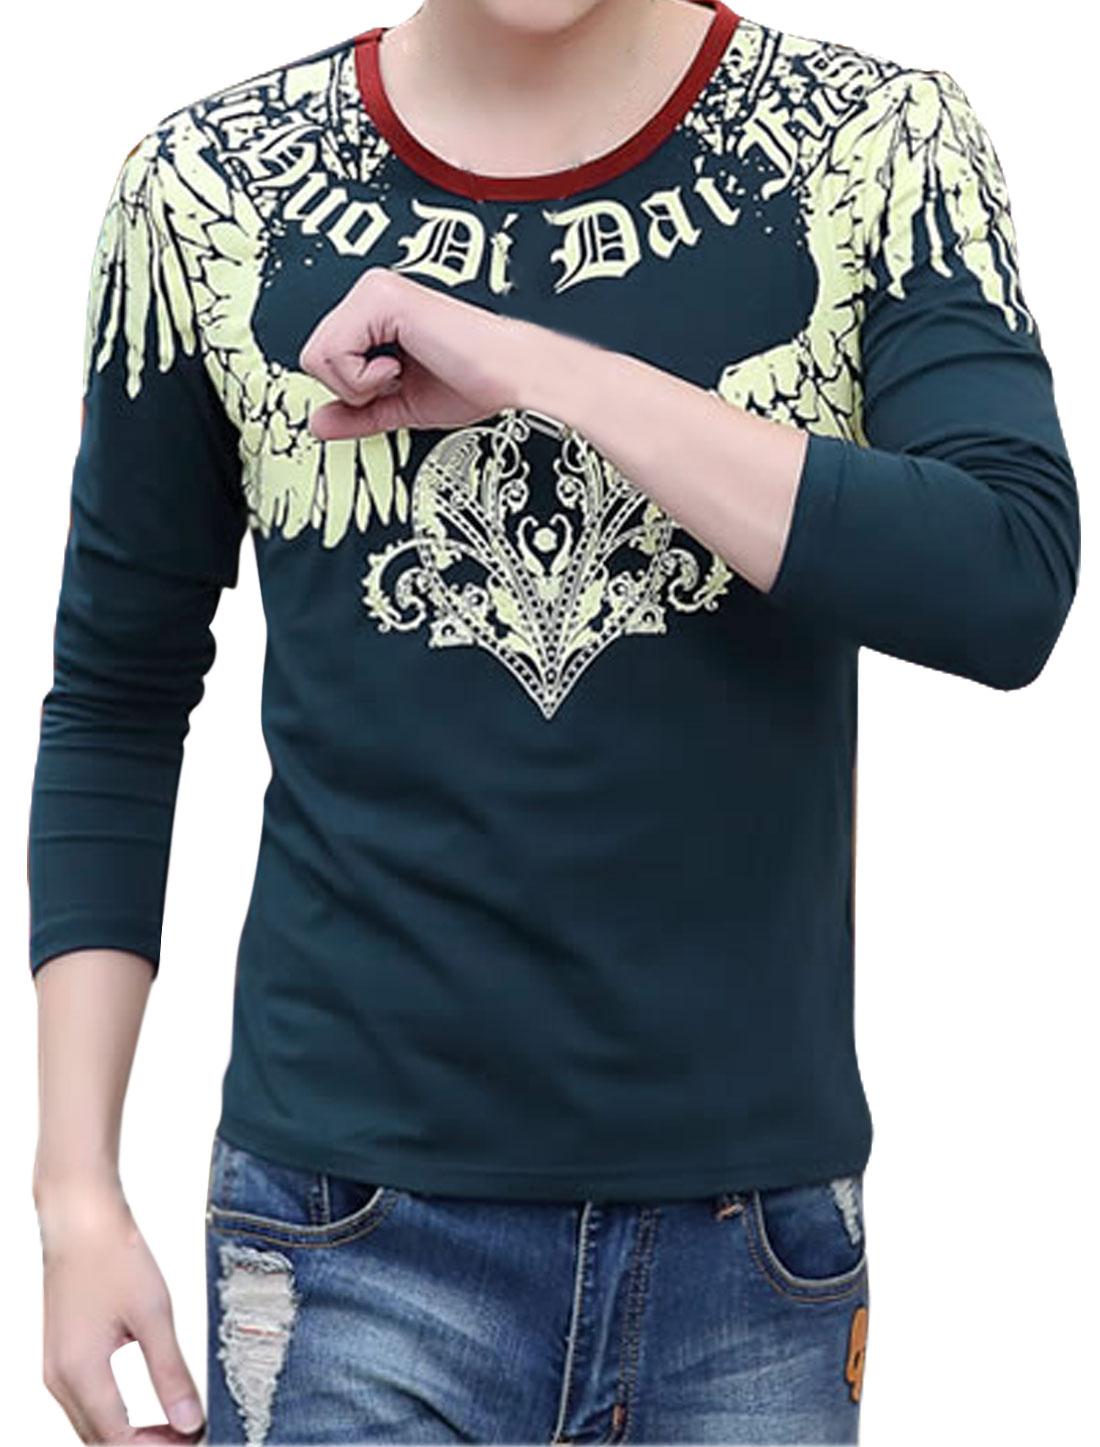 Men Long Sleeves Novelty Slim Fit Tee Shirt Blue S